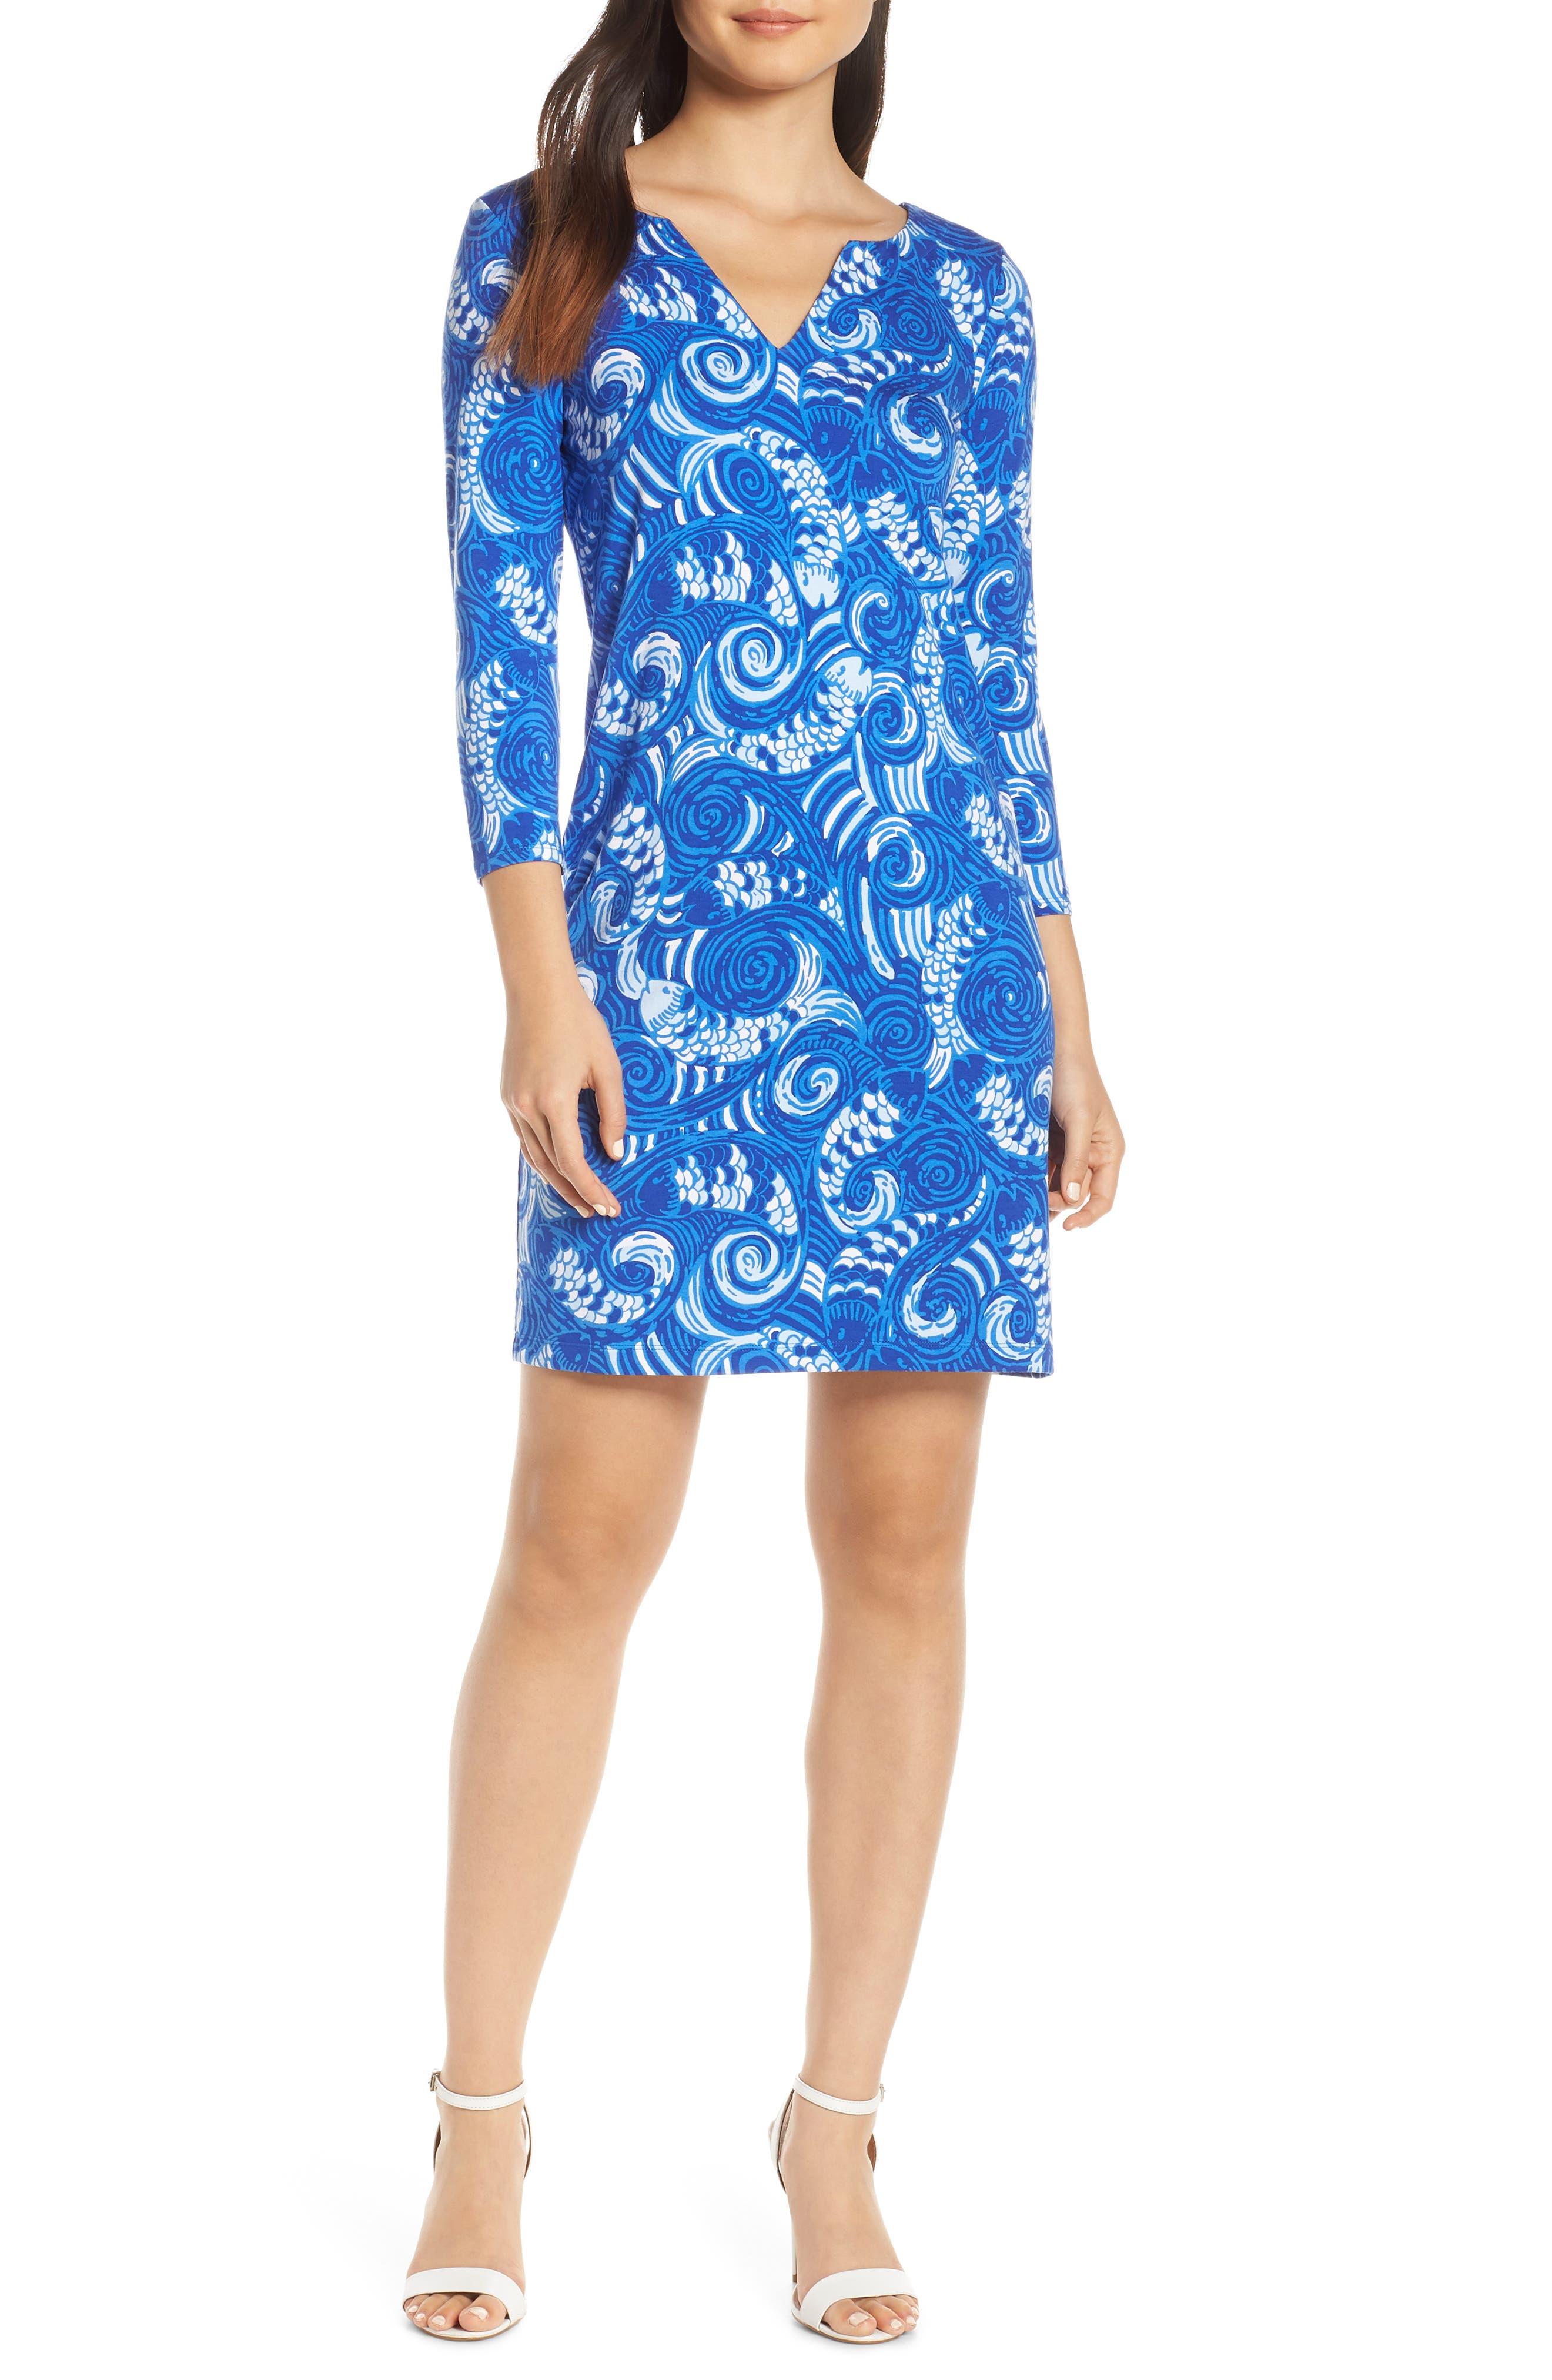 Lilly Pulitzer Sophiletta Upf 50+ Minidress, Blue